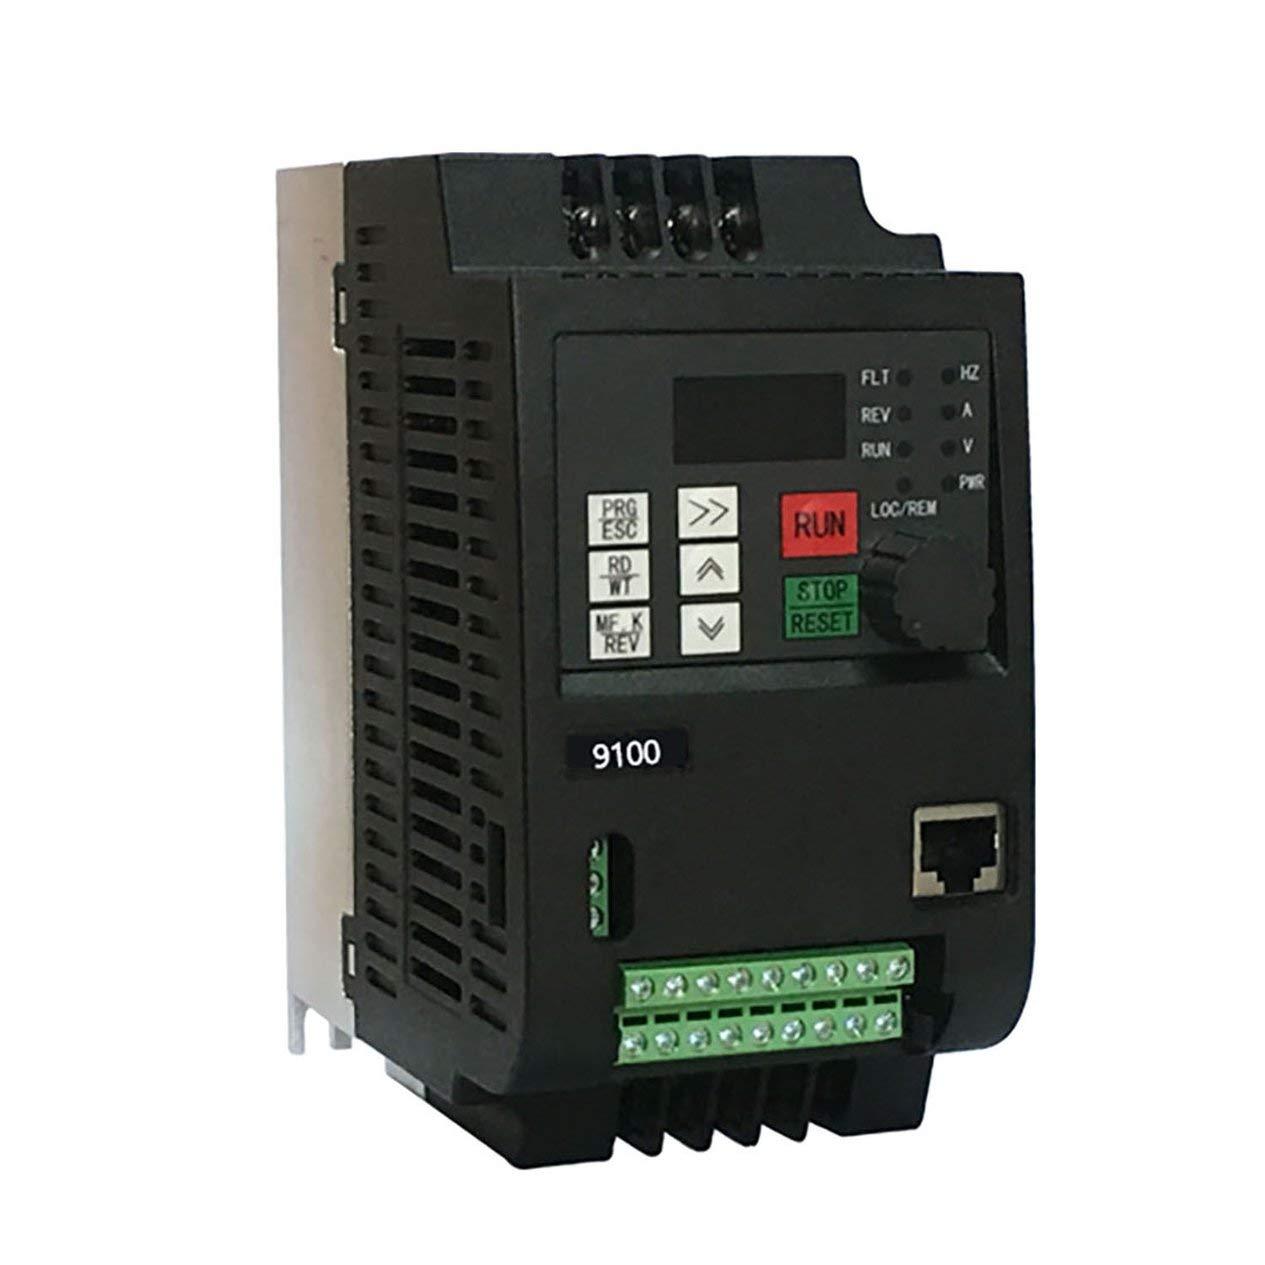 220V 2.2KW Single Phase Input 220V 3 Phase Output Frequency Converter Professional 9100-1T-00220-G 10A VFD Inverter